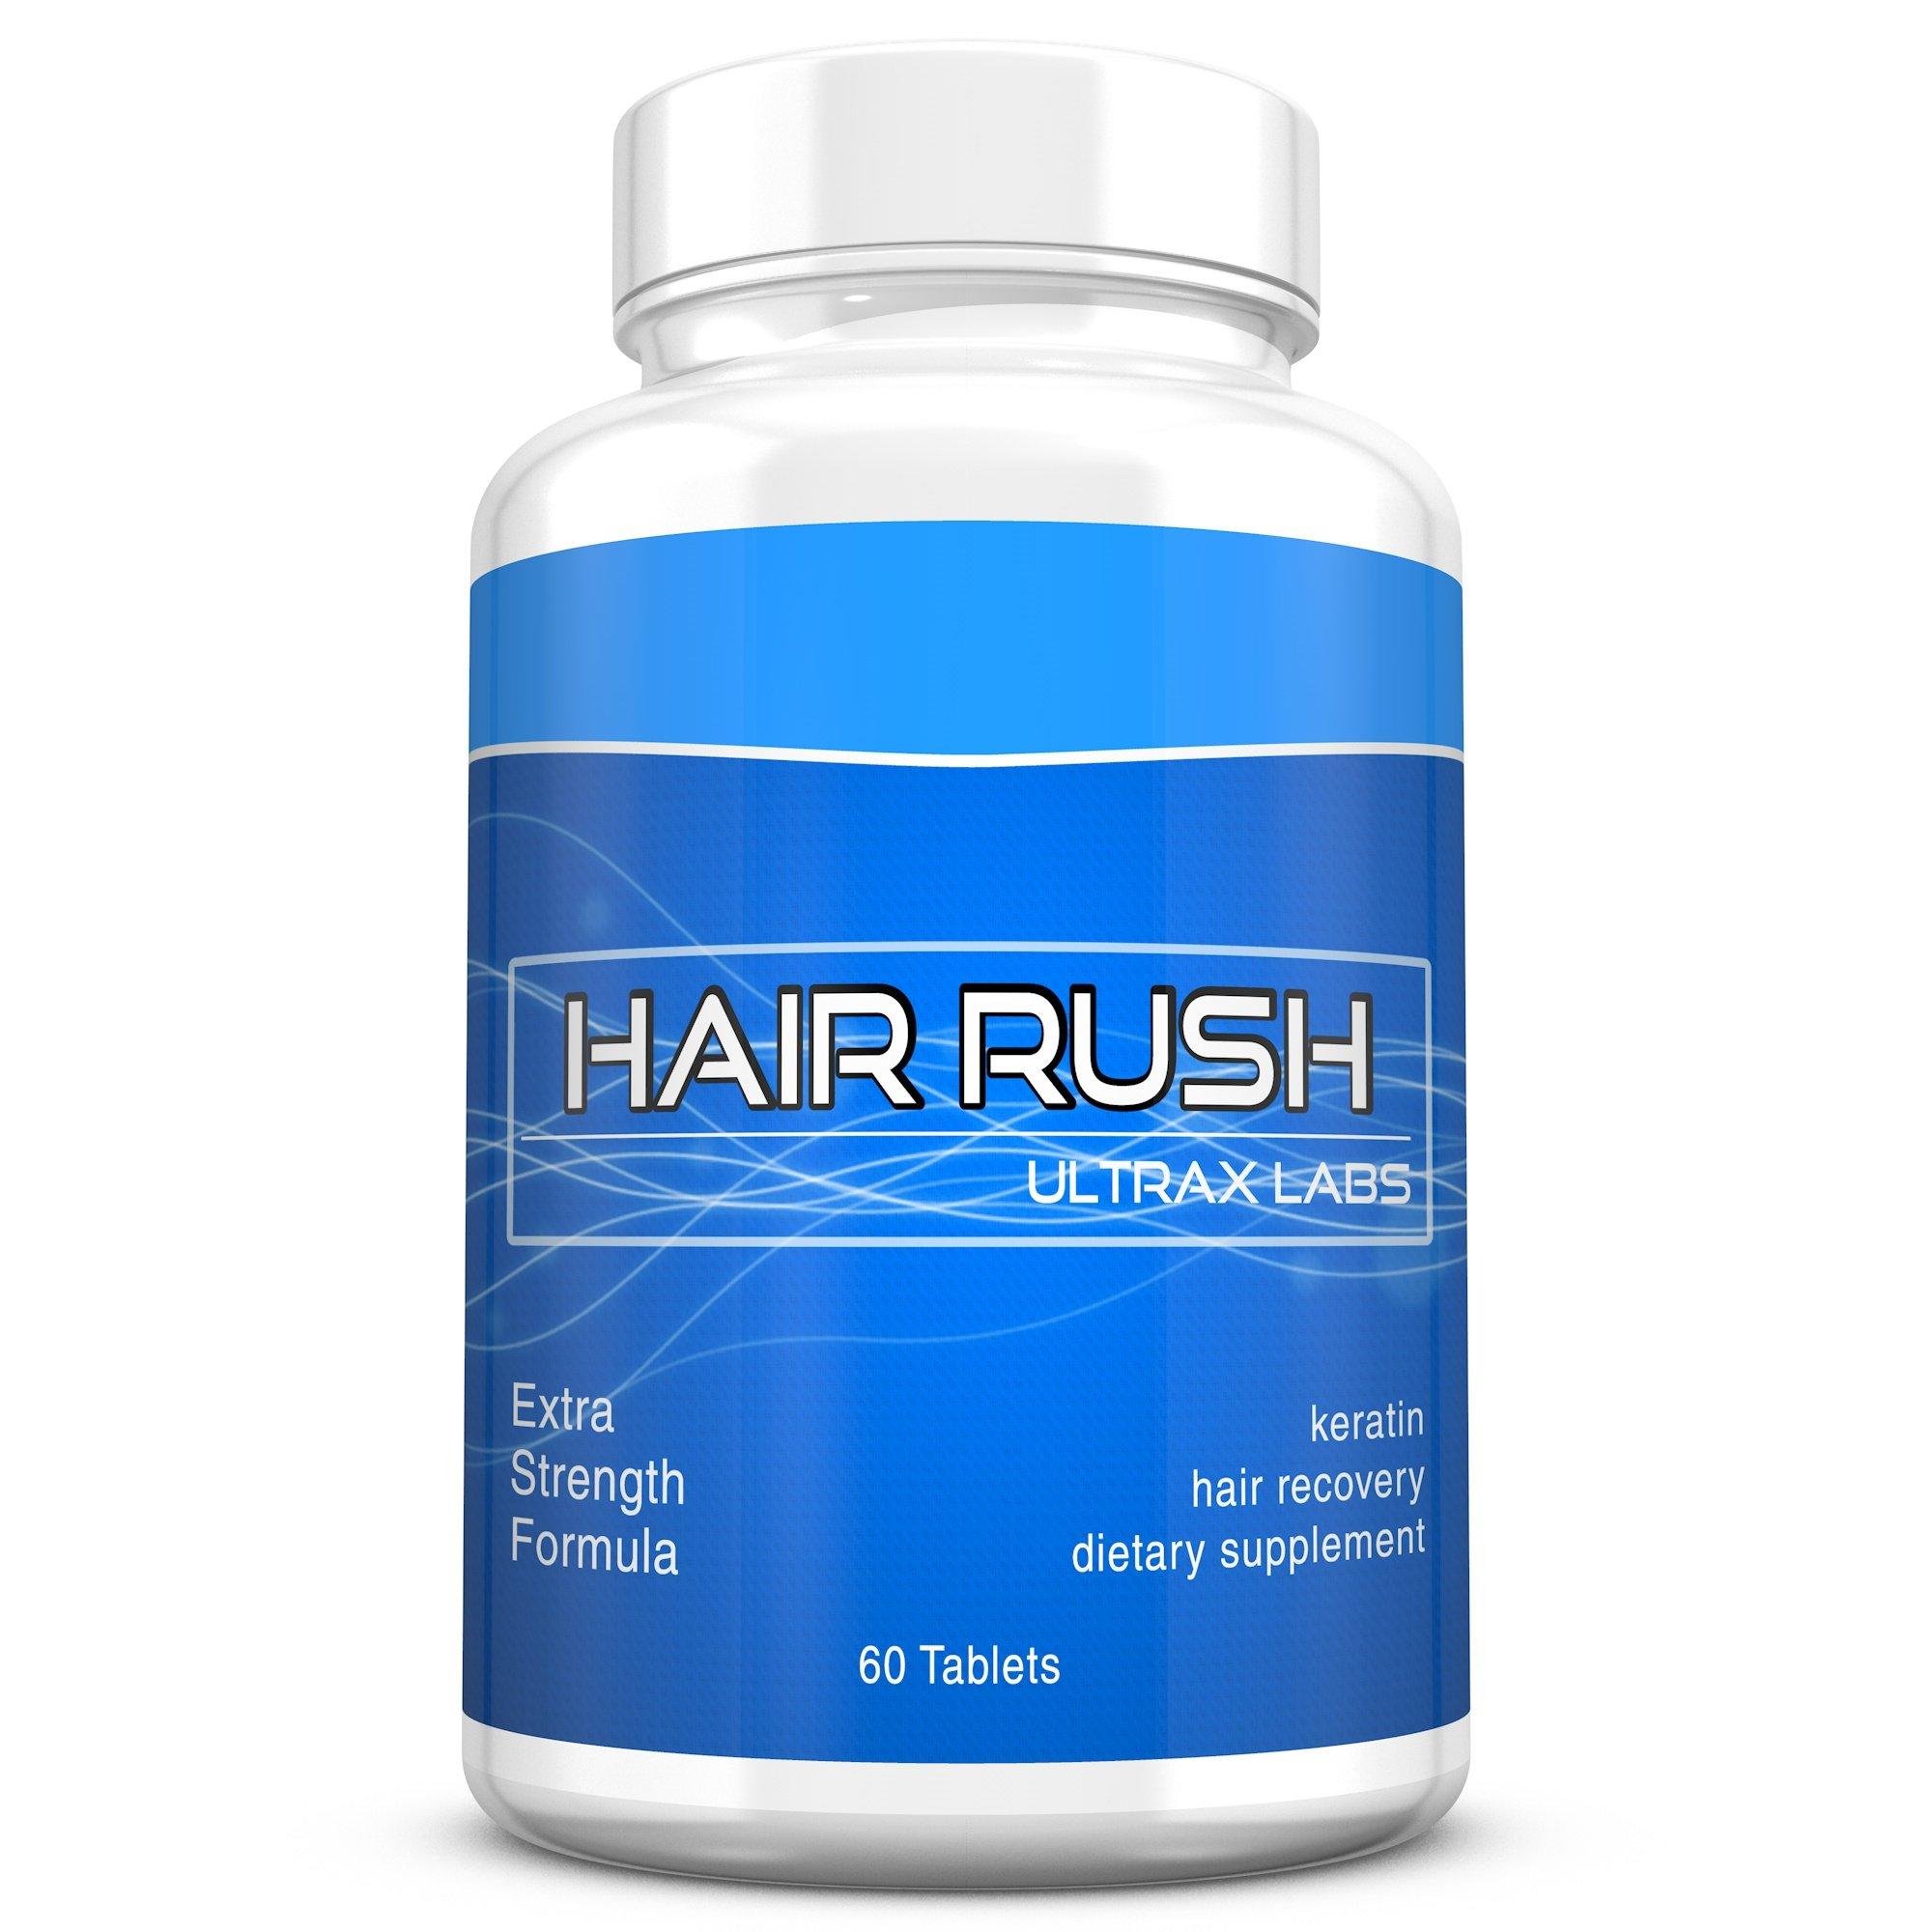 Ultrax Labs Hair Rush | Maxx Hair Growth & Anti Hair Loss Nutrient Solubilized Keratin Vitamin Supplement, 60 tablets. by Ultrax Labs